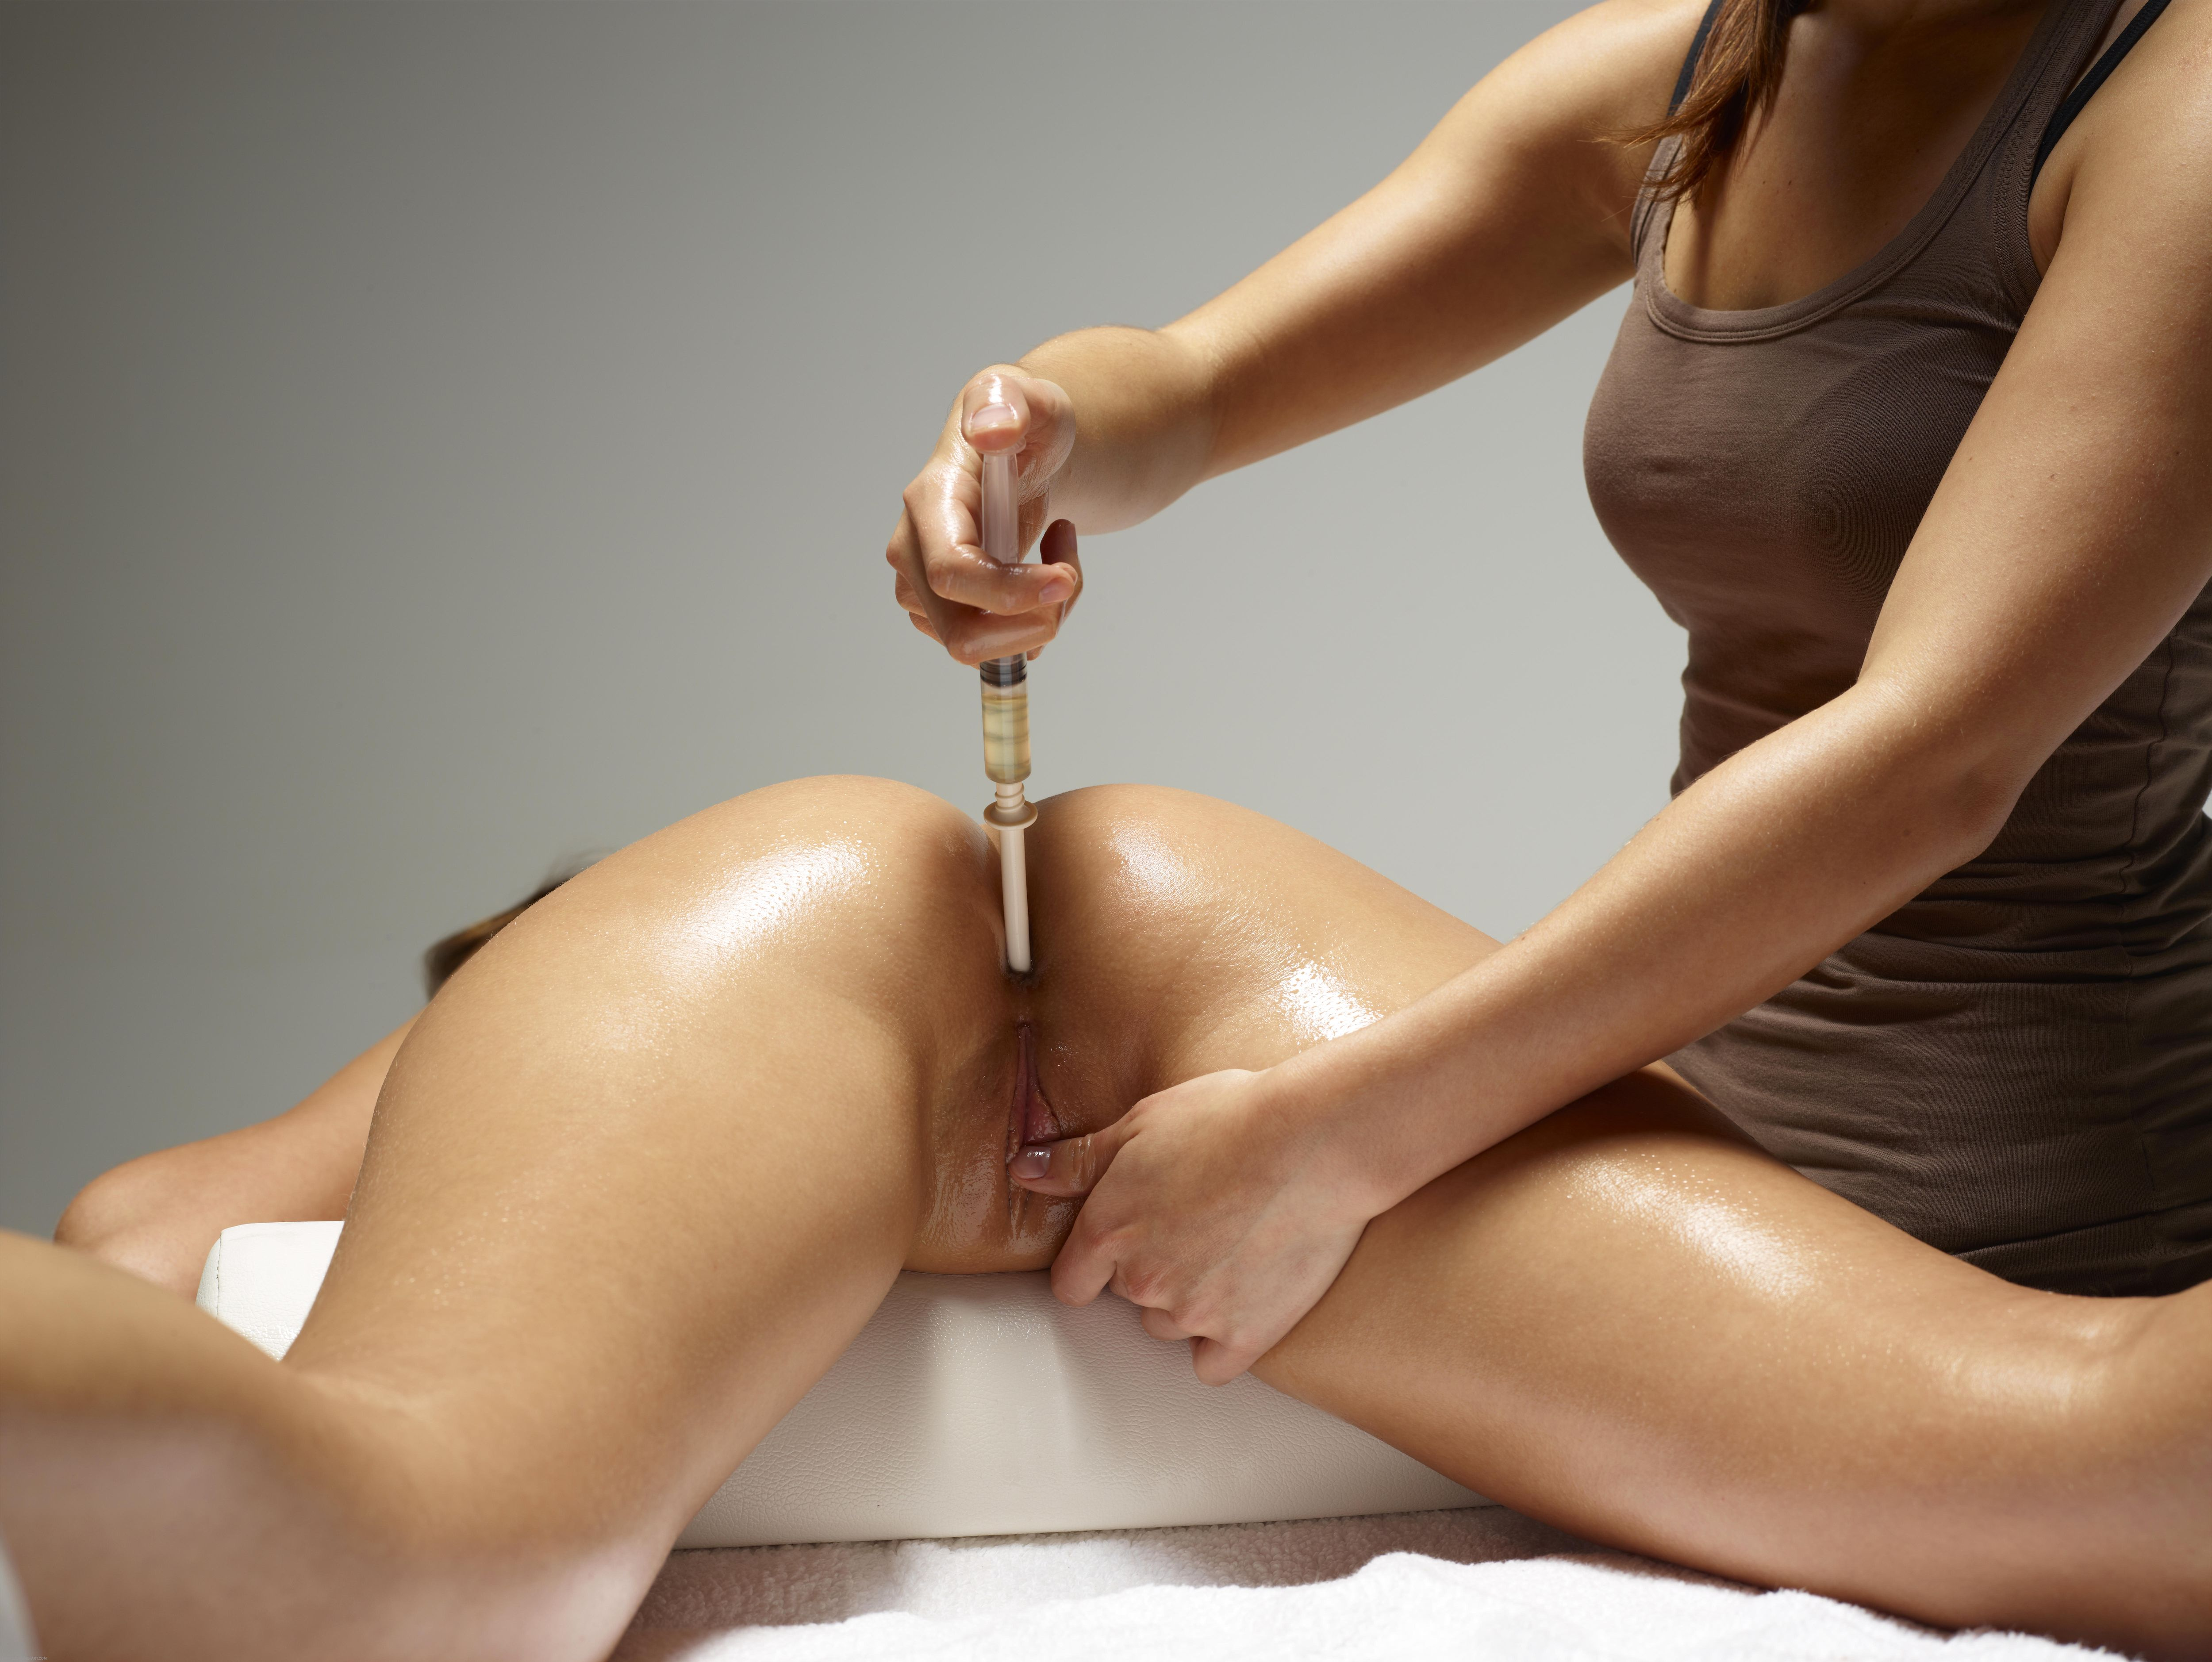 Asian massage listing nyc